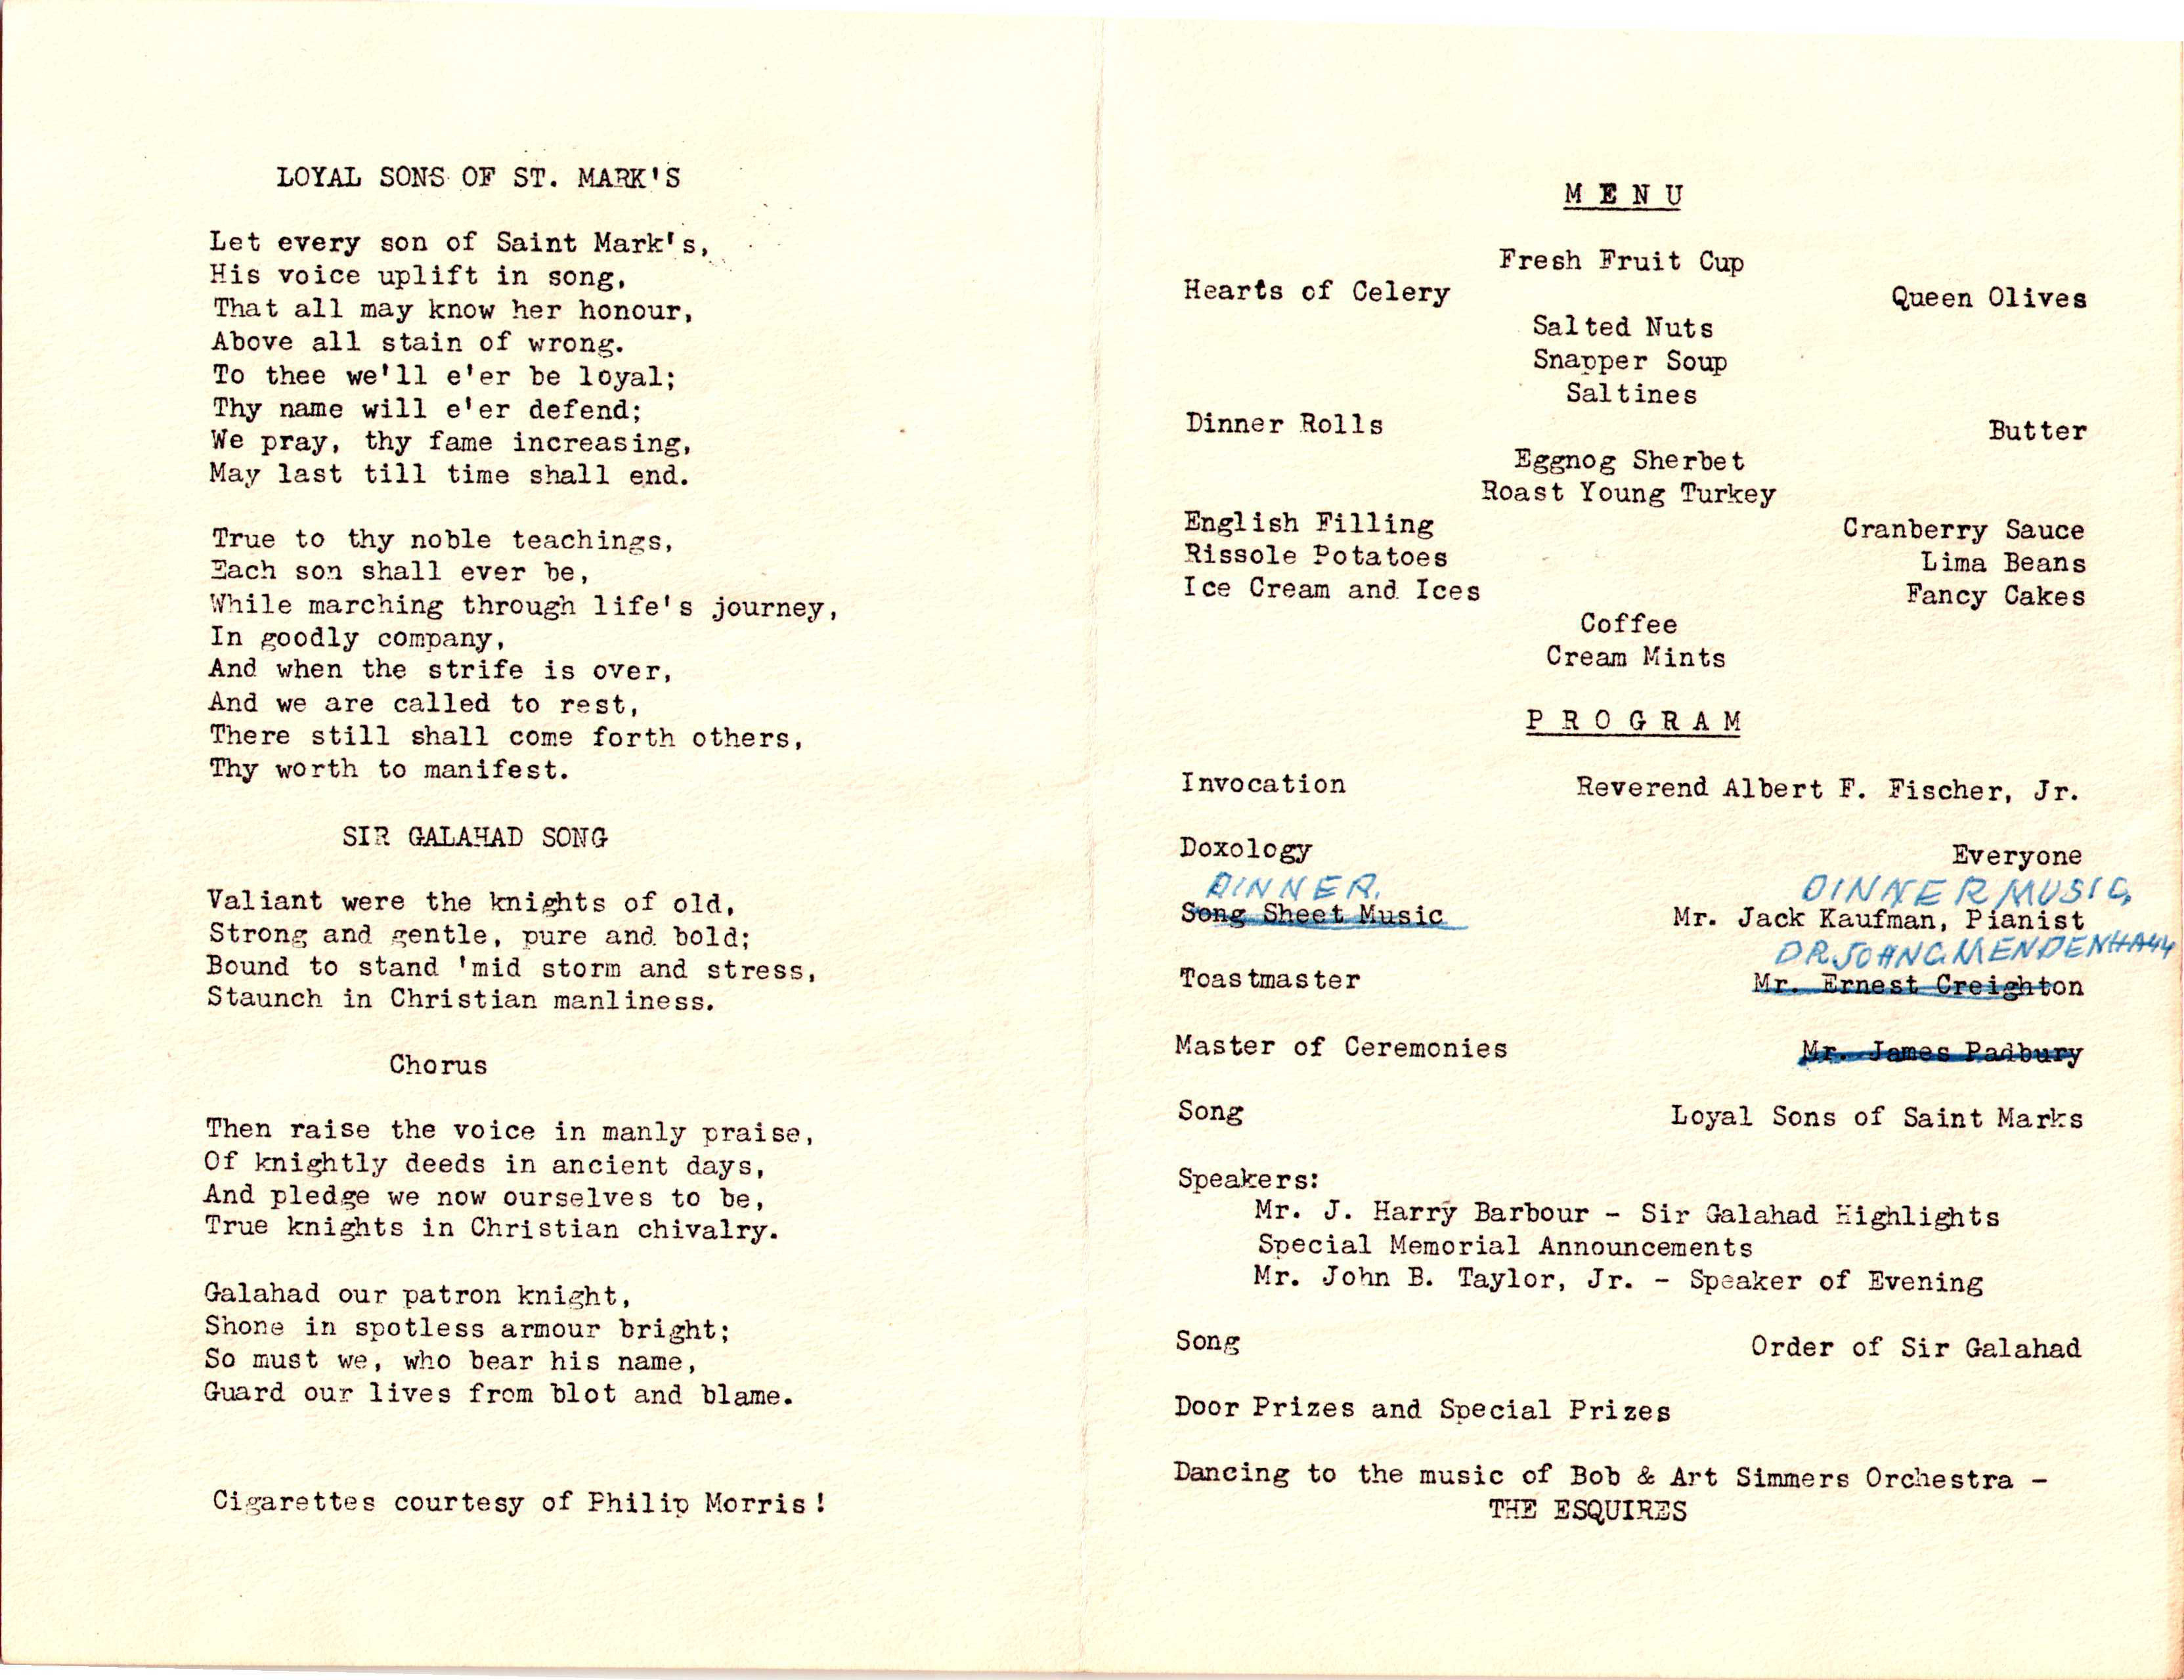 Reunion Dinner Program of the Order of Sir Galahad at St. Mark's ...